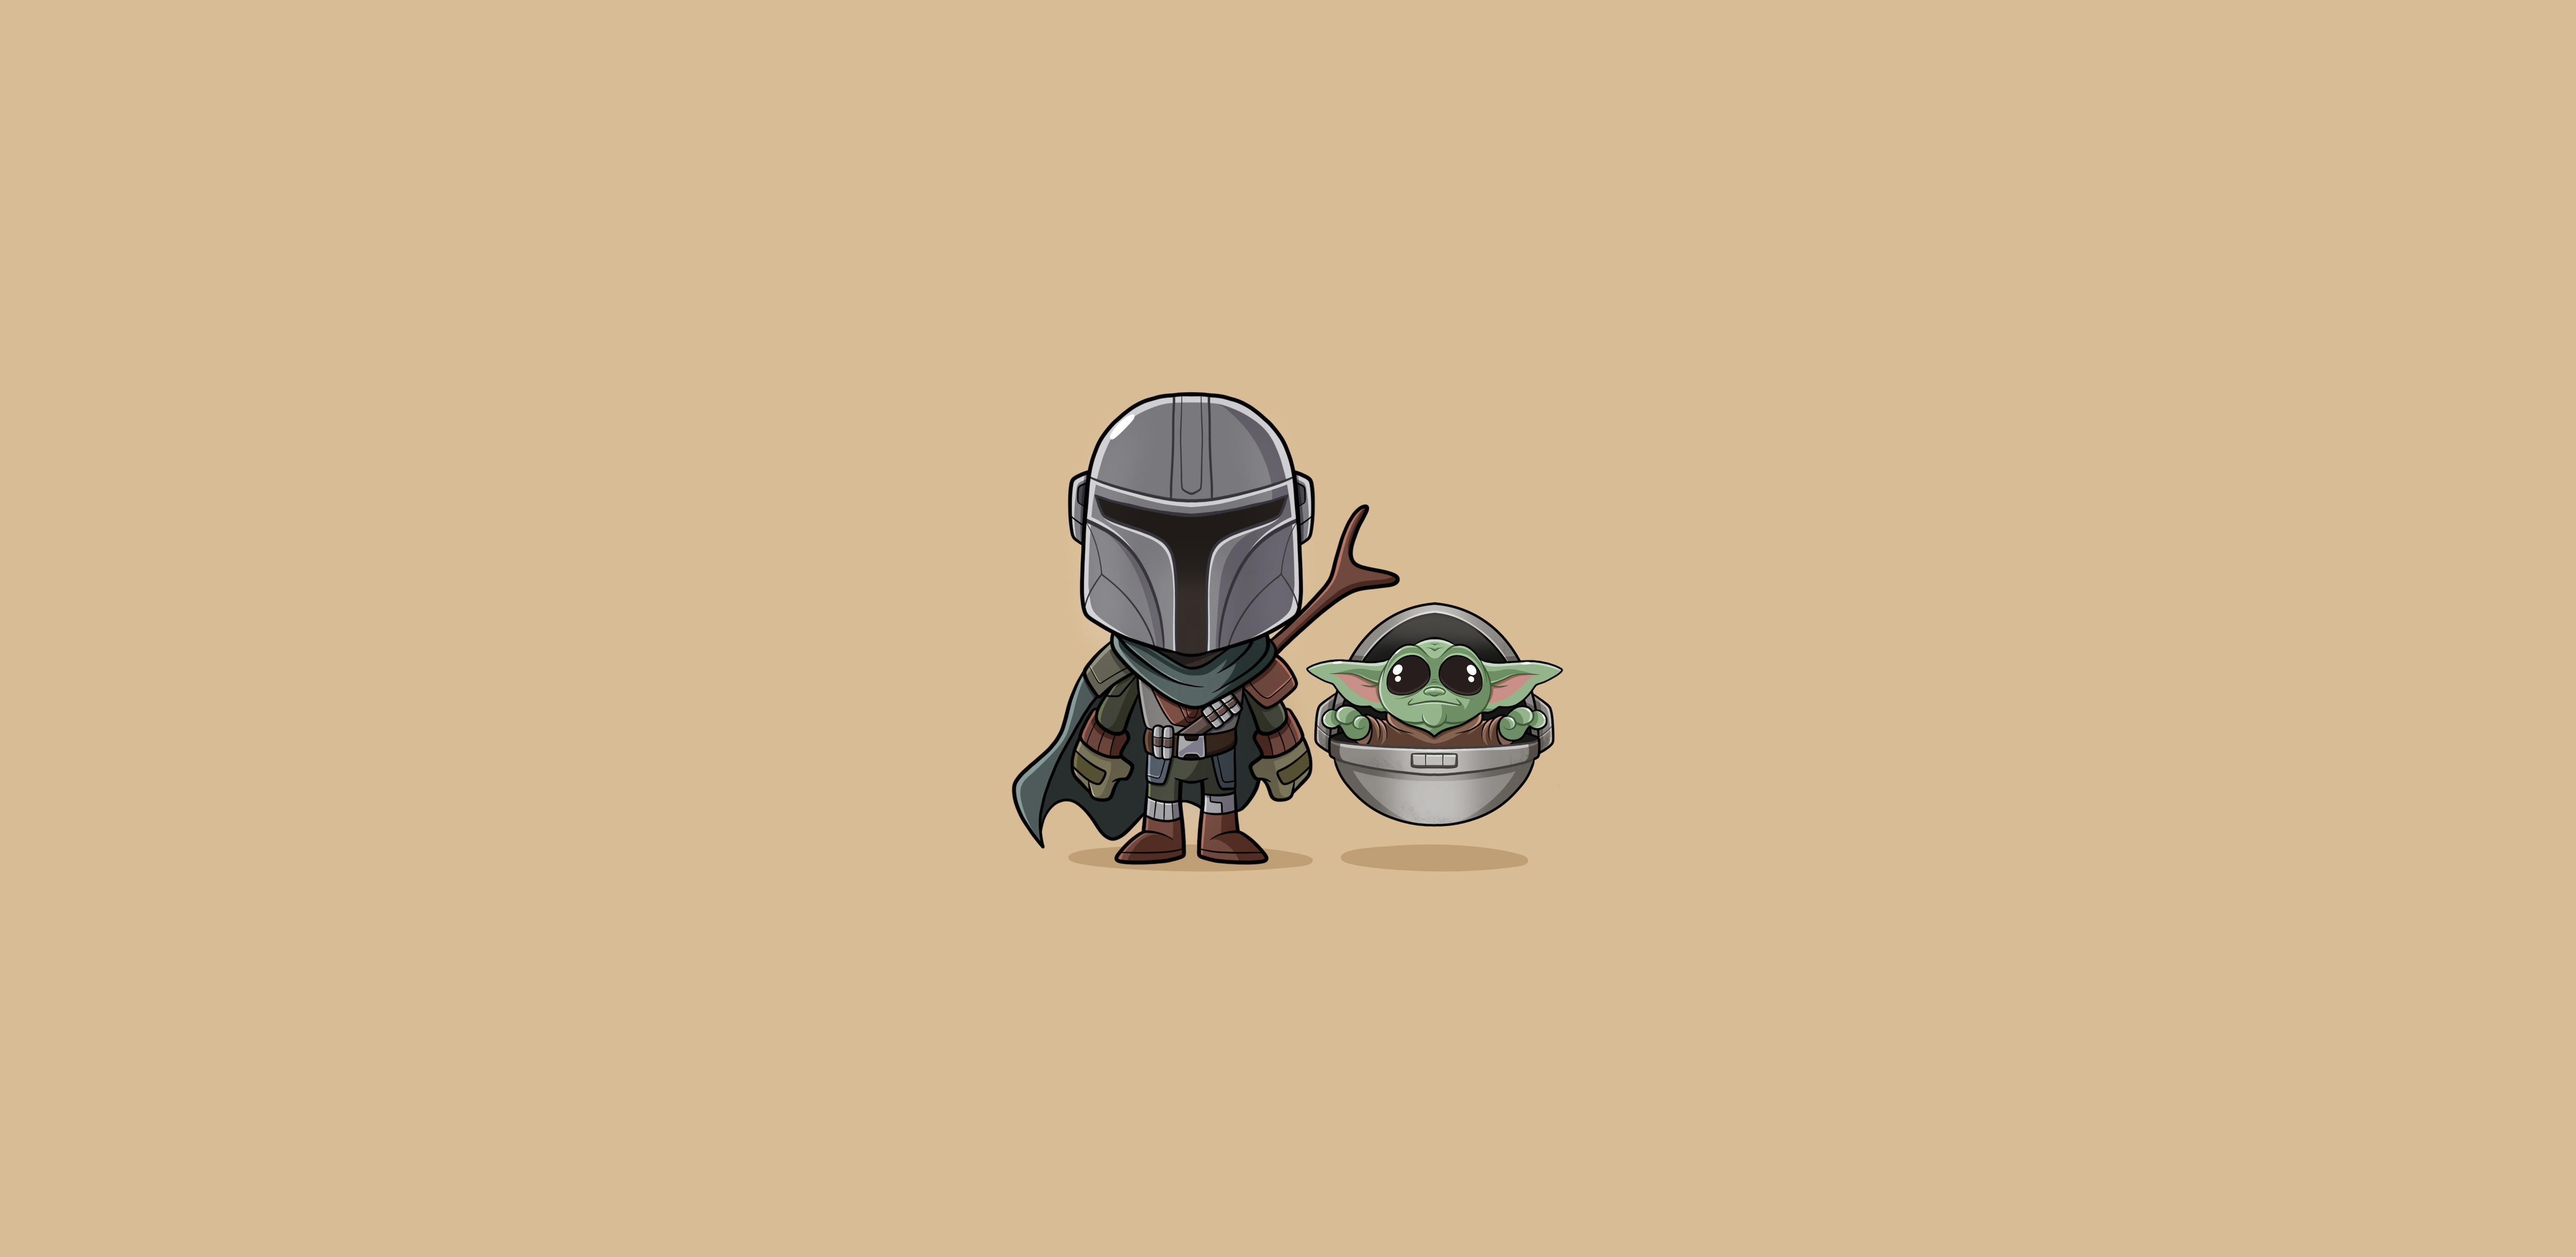 Baby Yoda Star Wars minimalism illustration The Mandalorian 1734267